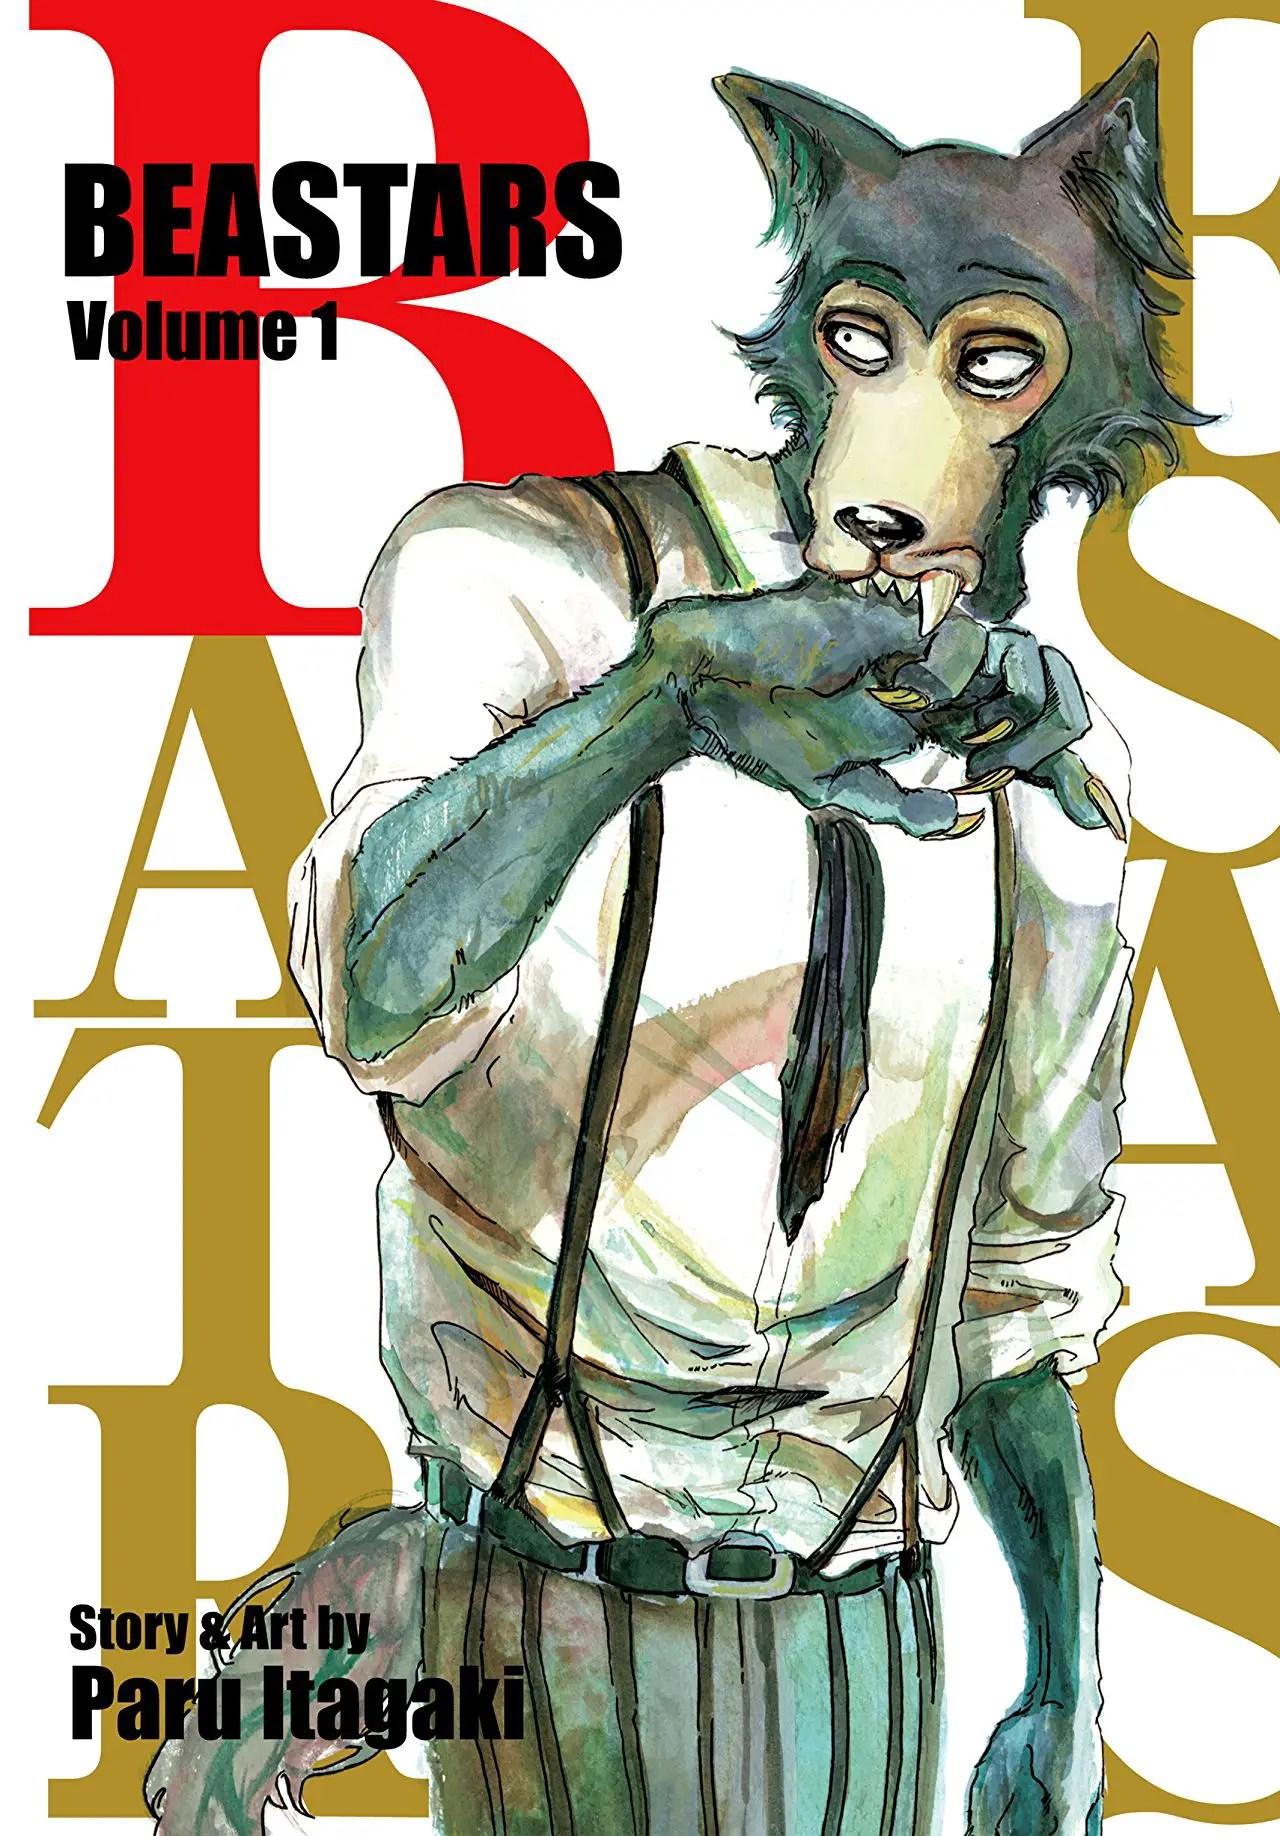 Beastars Vol. 1 Review